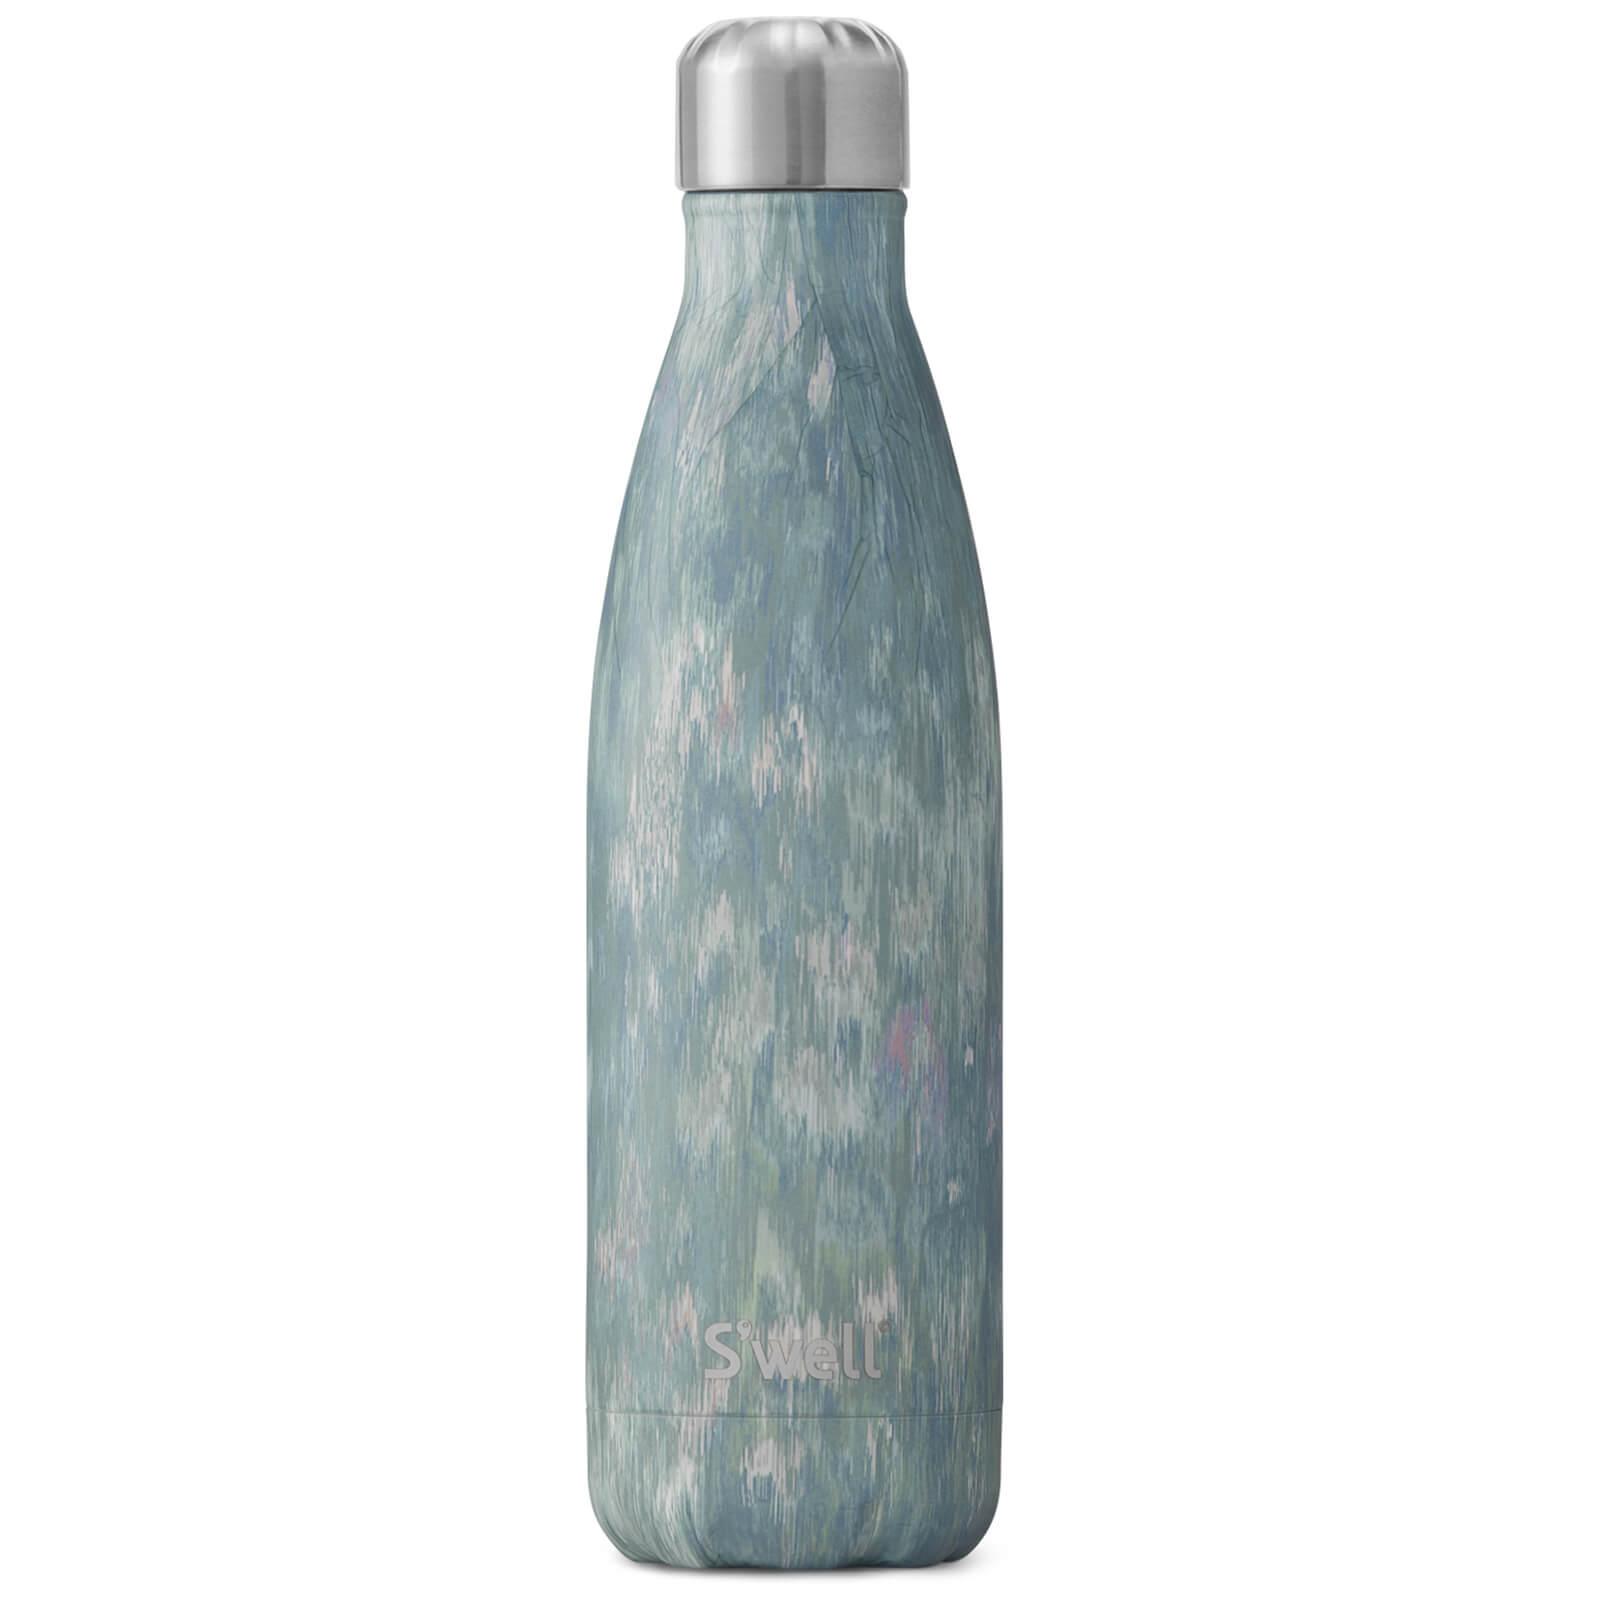 S'well Watercolor Lilies Water Bottle 500ml